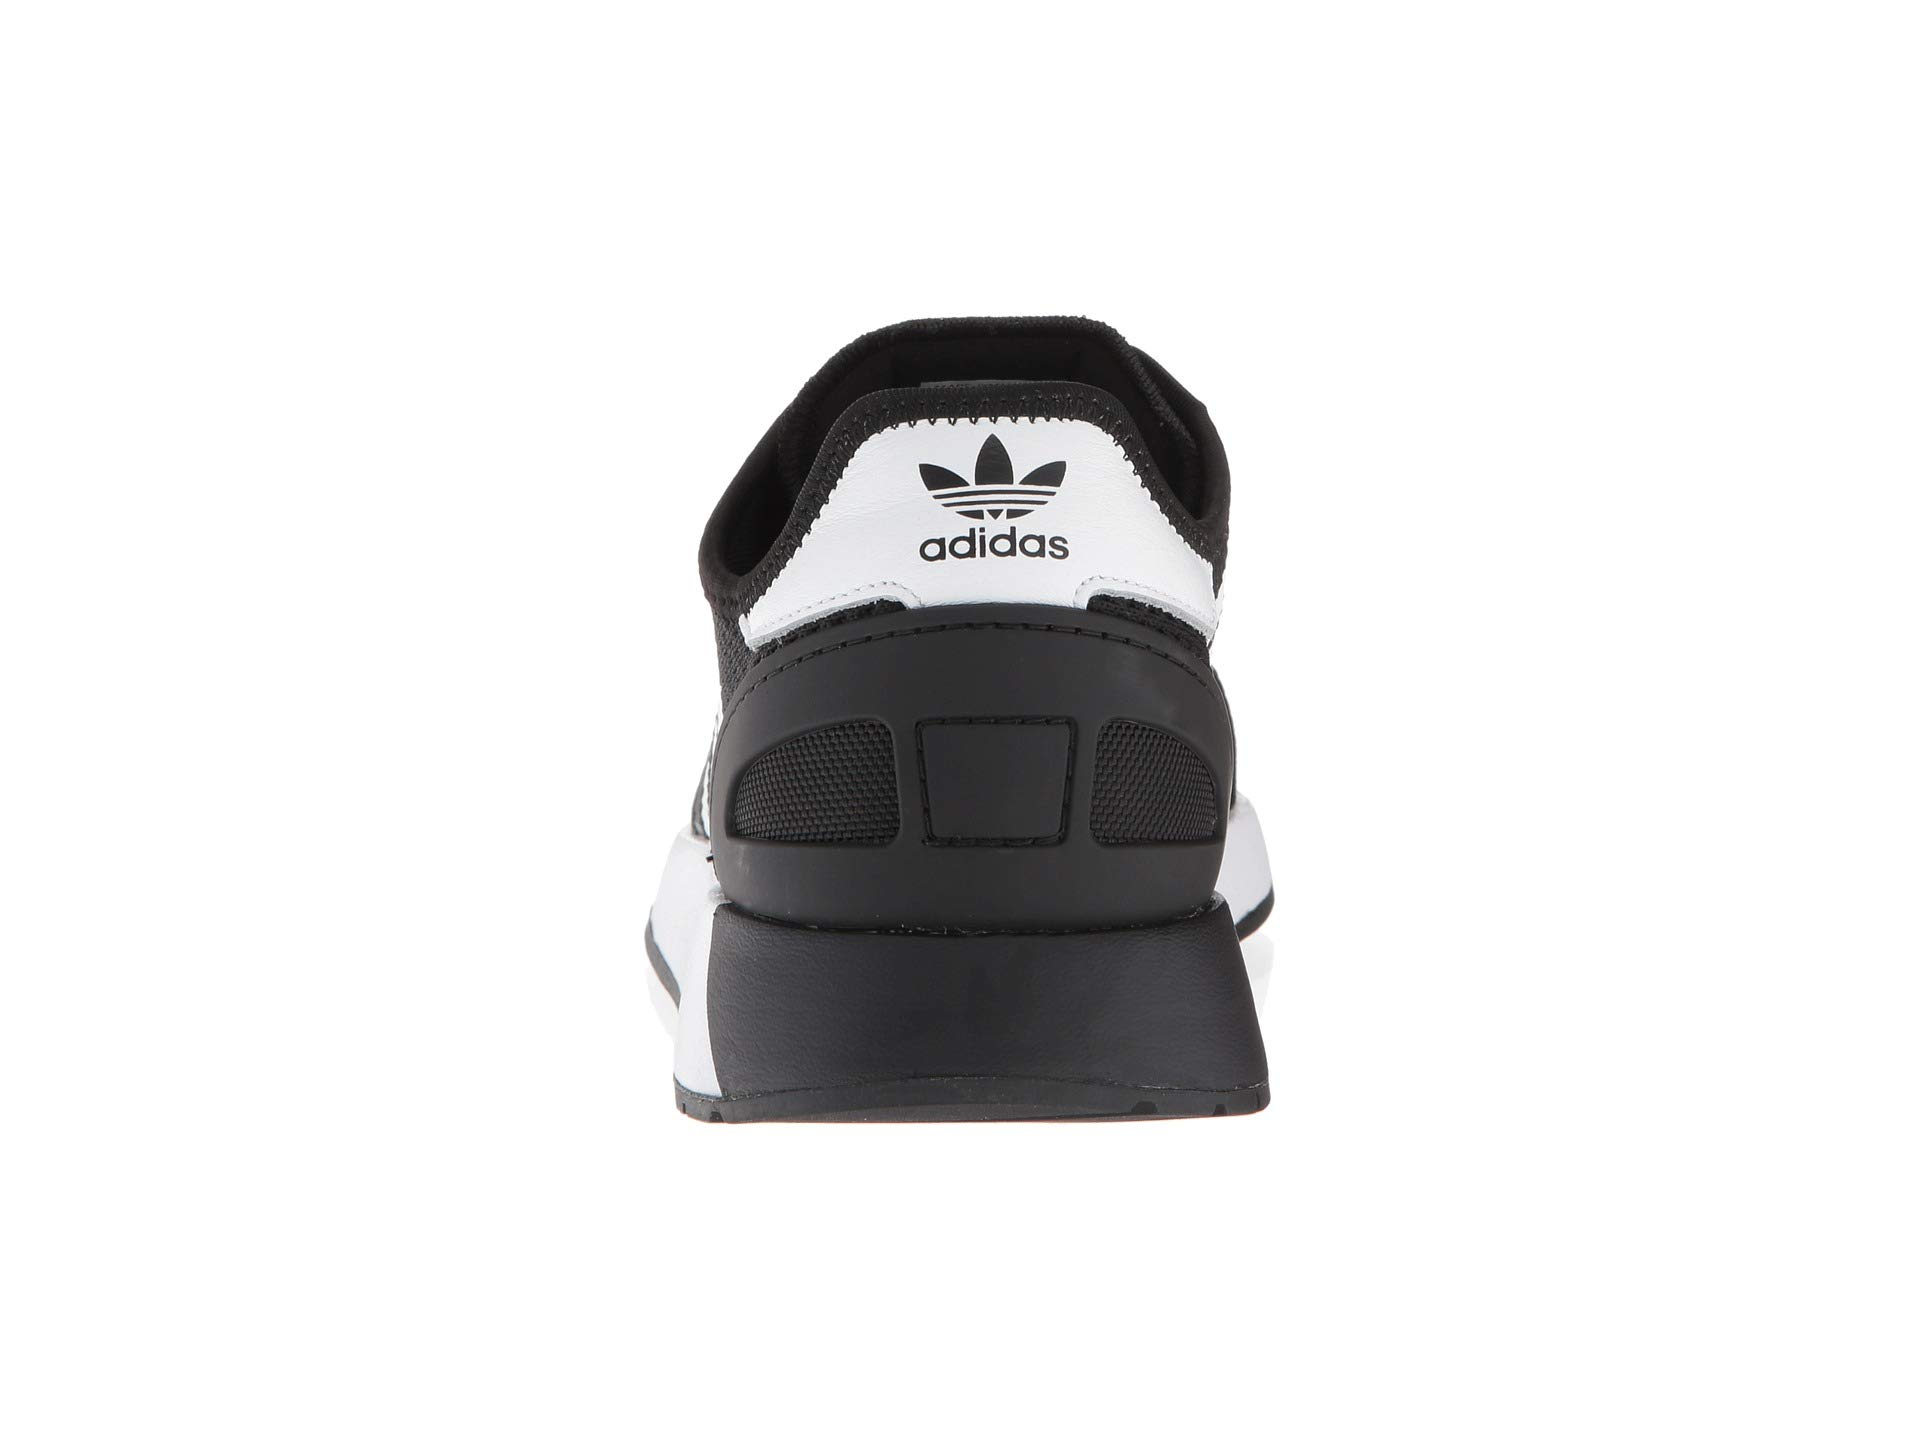 Originals Adidas white black N Black 5923 R0x0HB